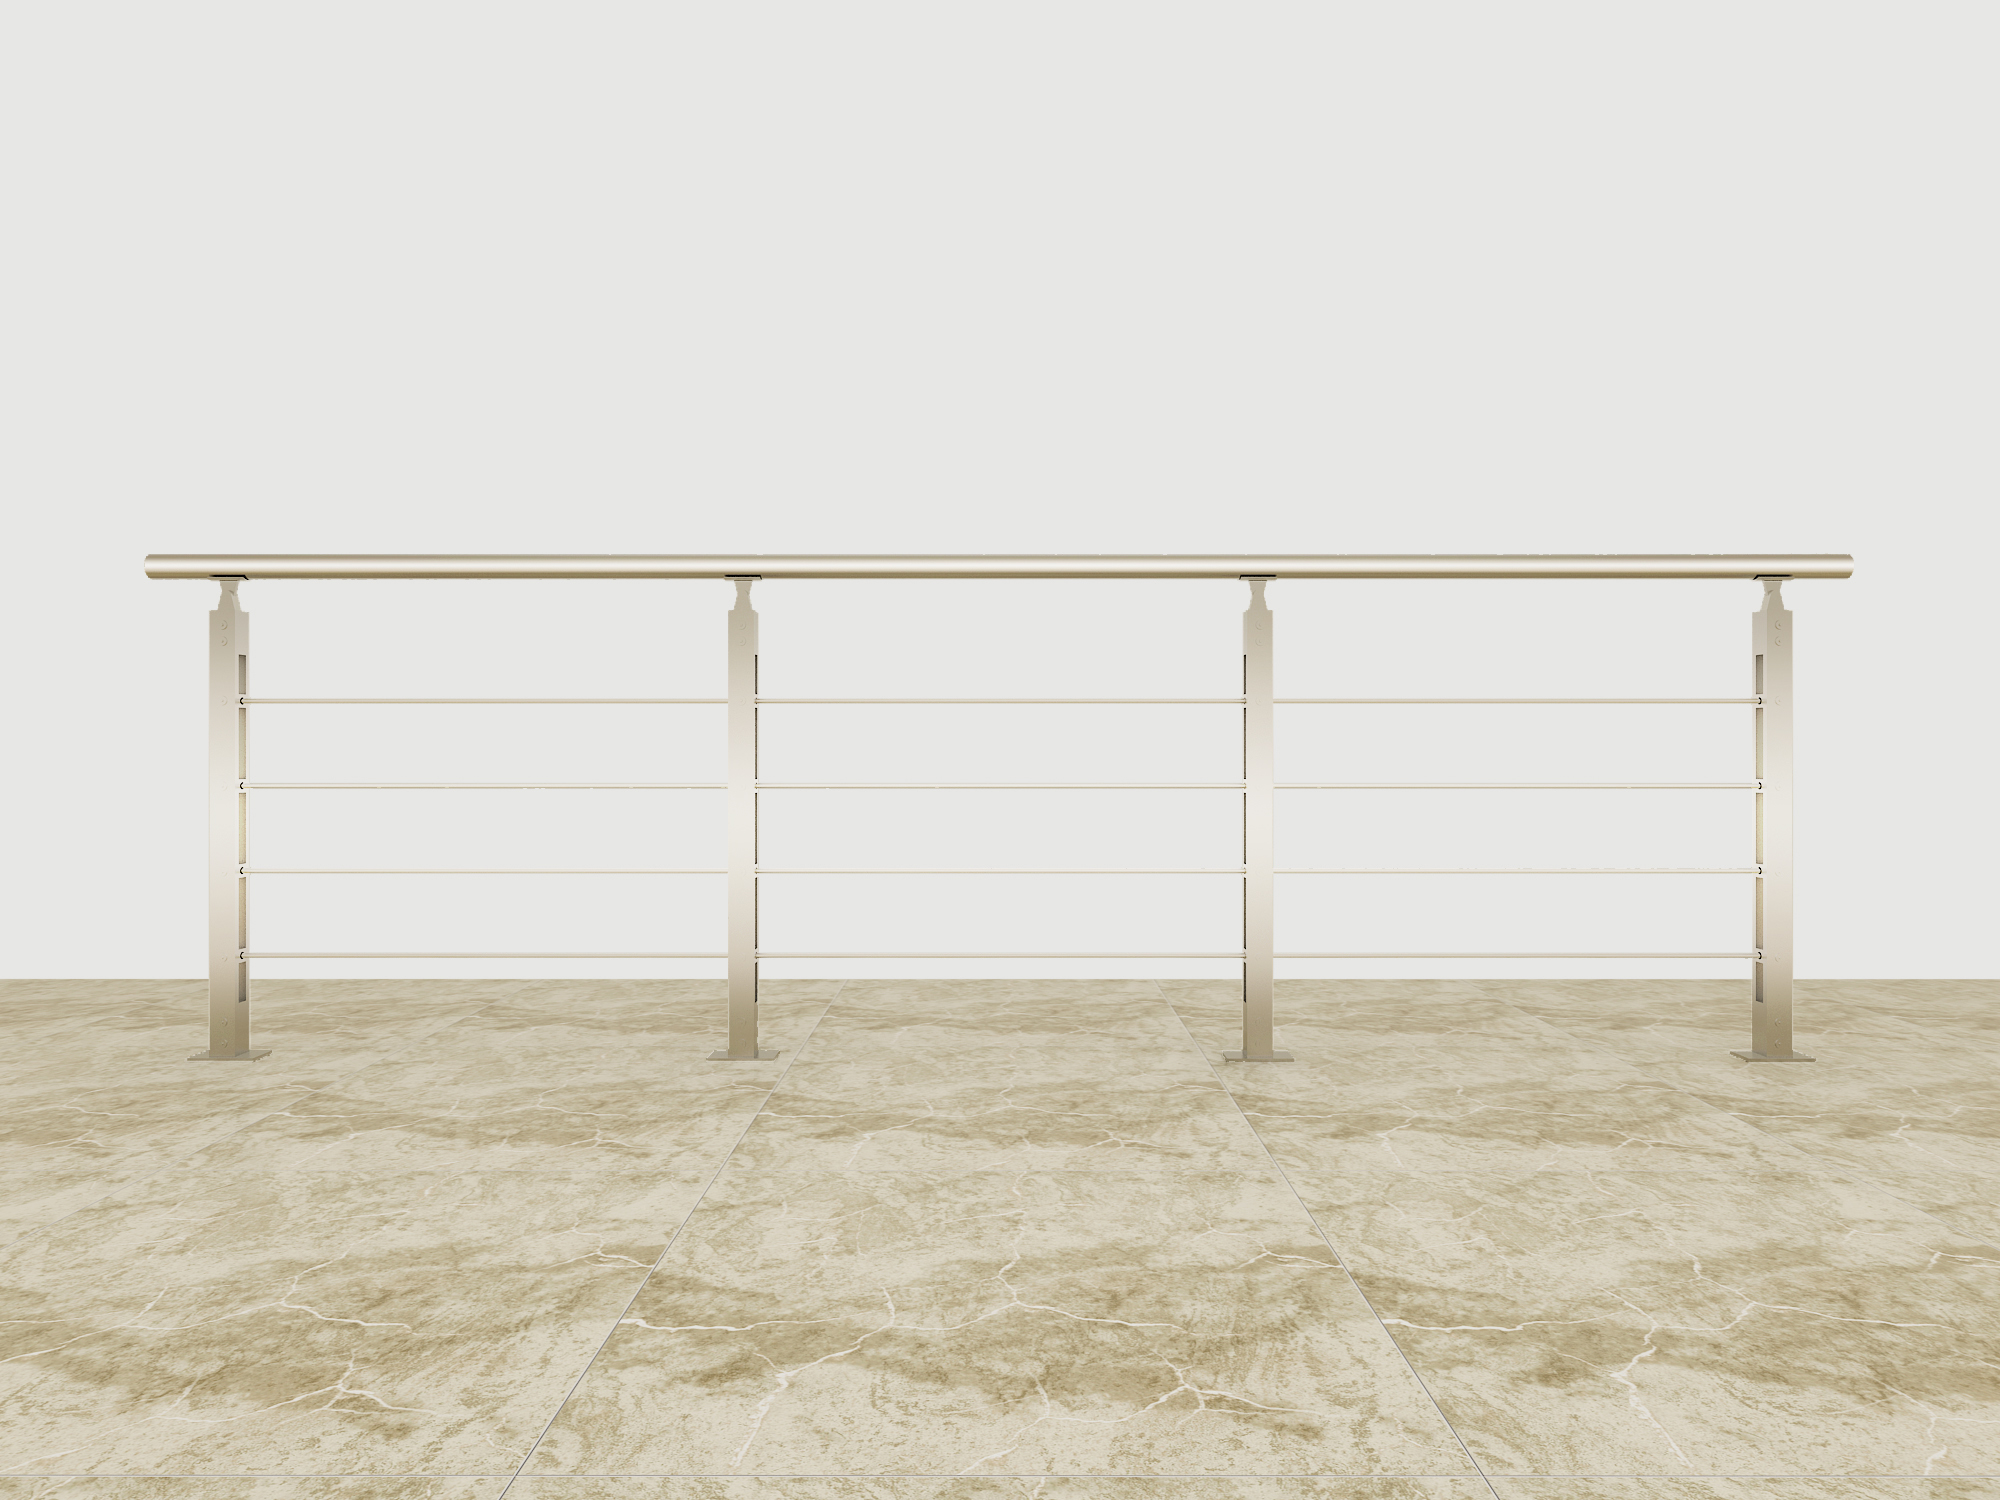 Best Choice Exceptional Quality Popular Design Aluminum solid-rod railing YKB-AR002